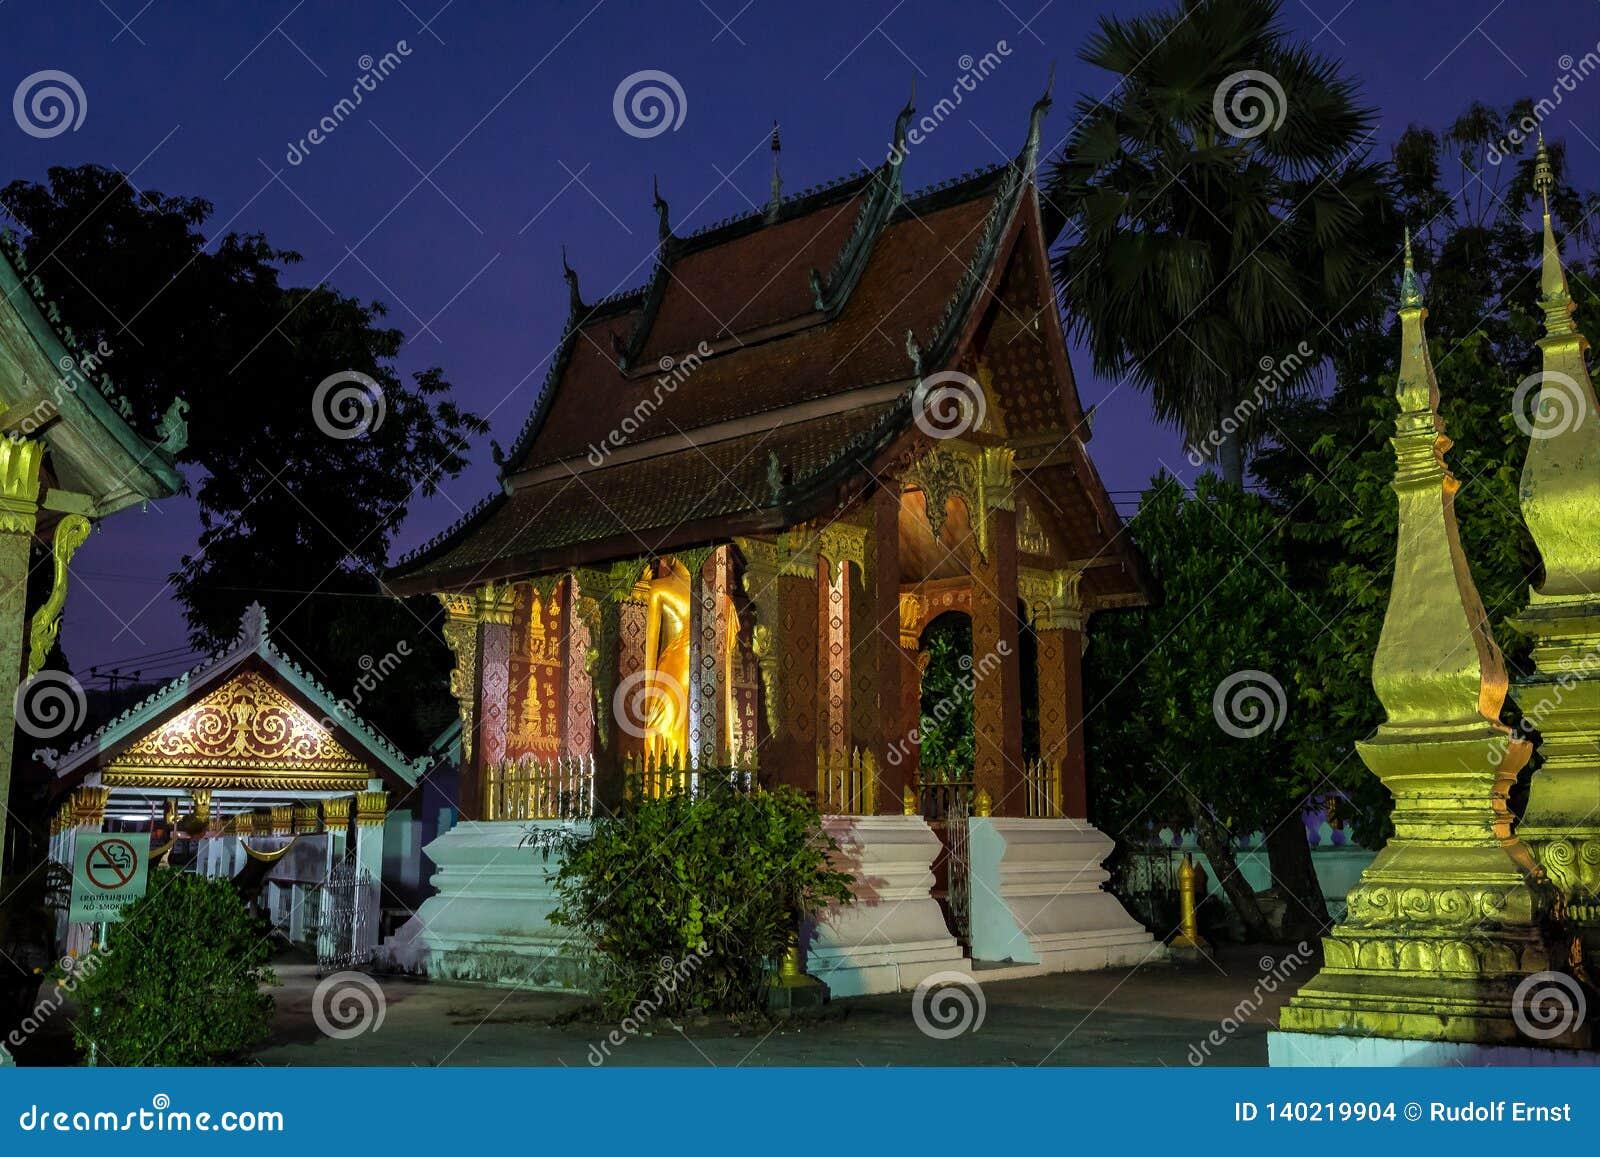 Wat Sensoukharam in Luang Prabang at night in Laos